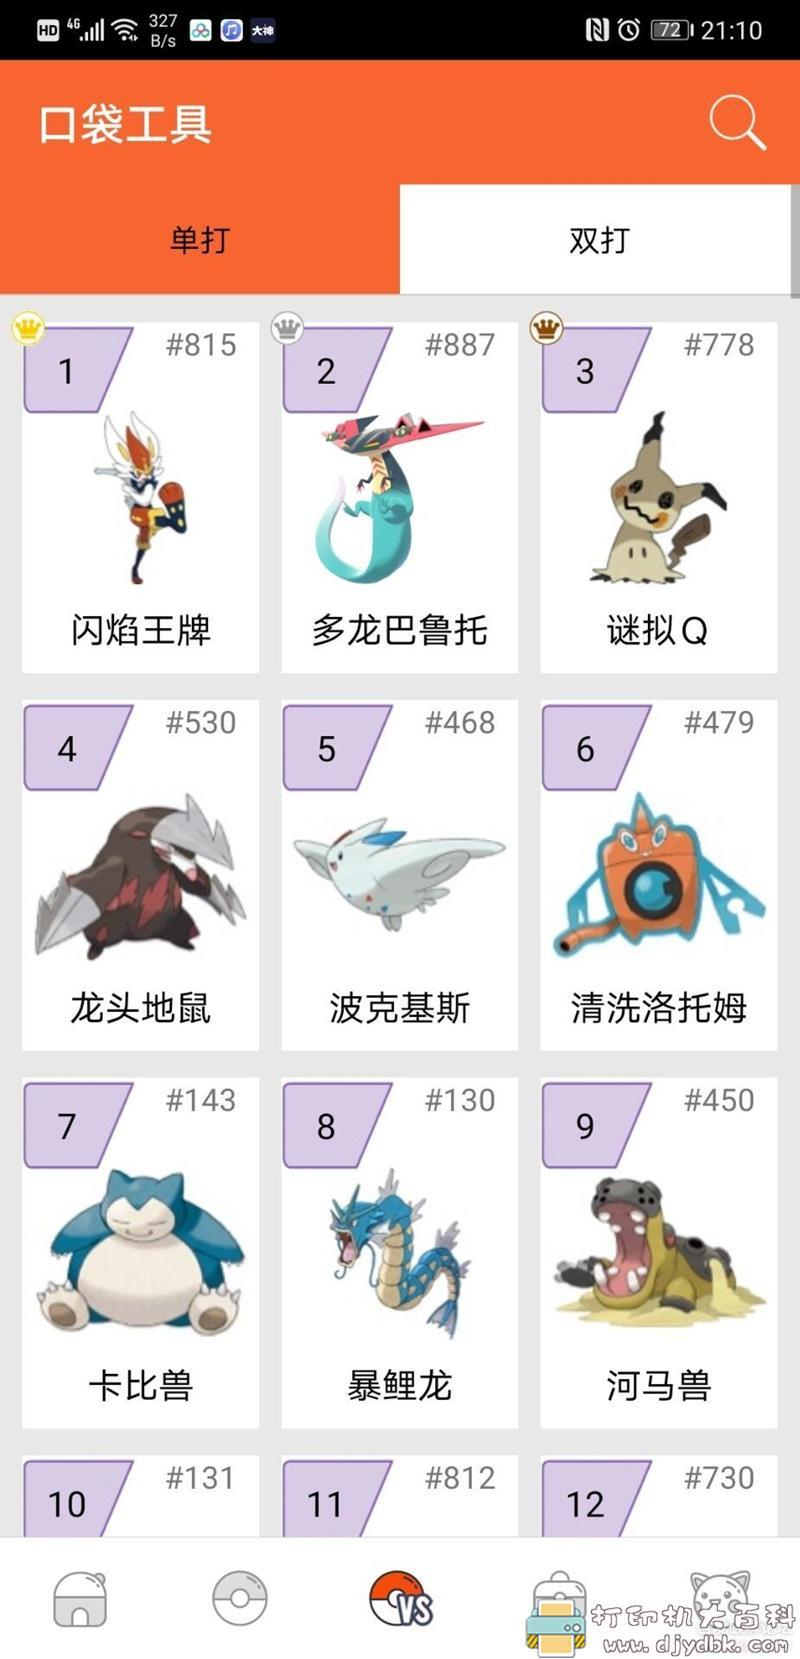 PC游戏分享:POKEMMO(口袋妖怪 网游版) 配图 No.10